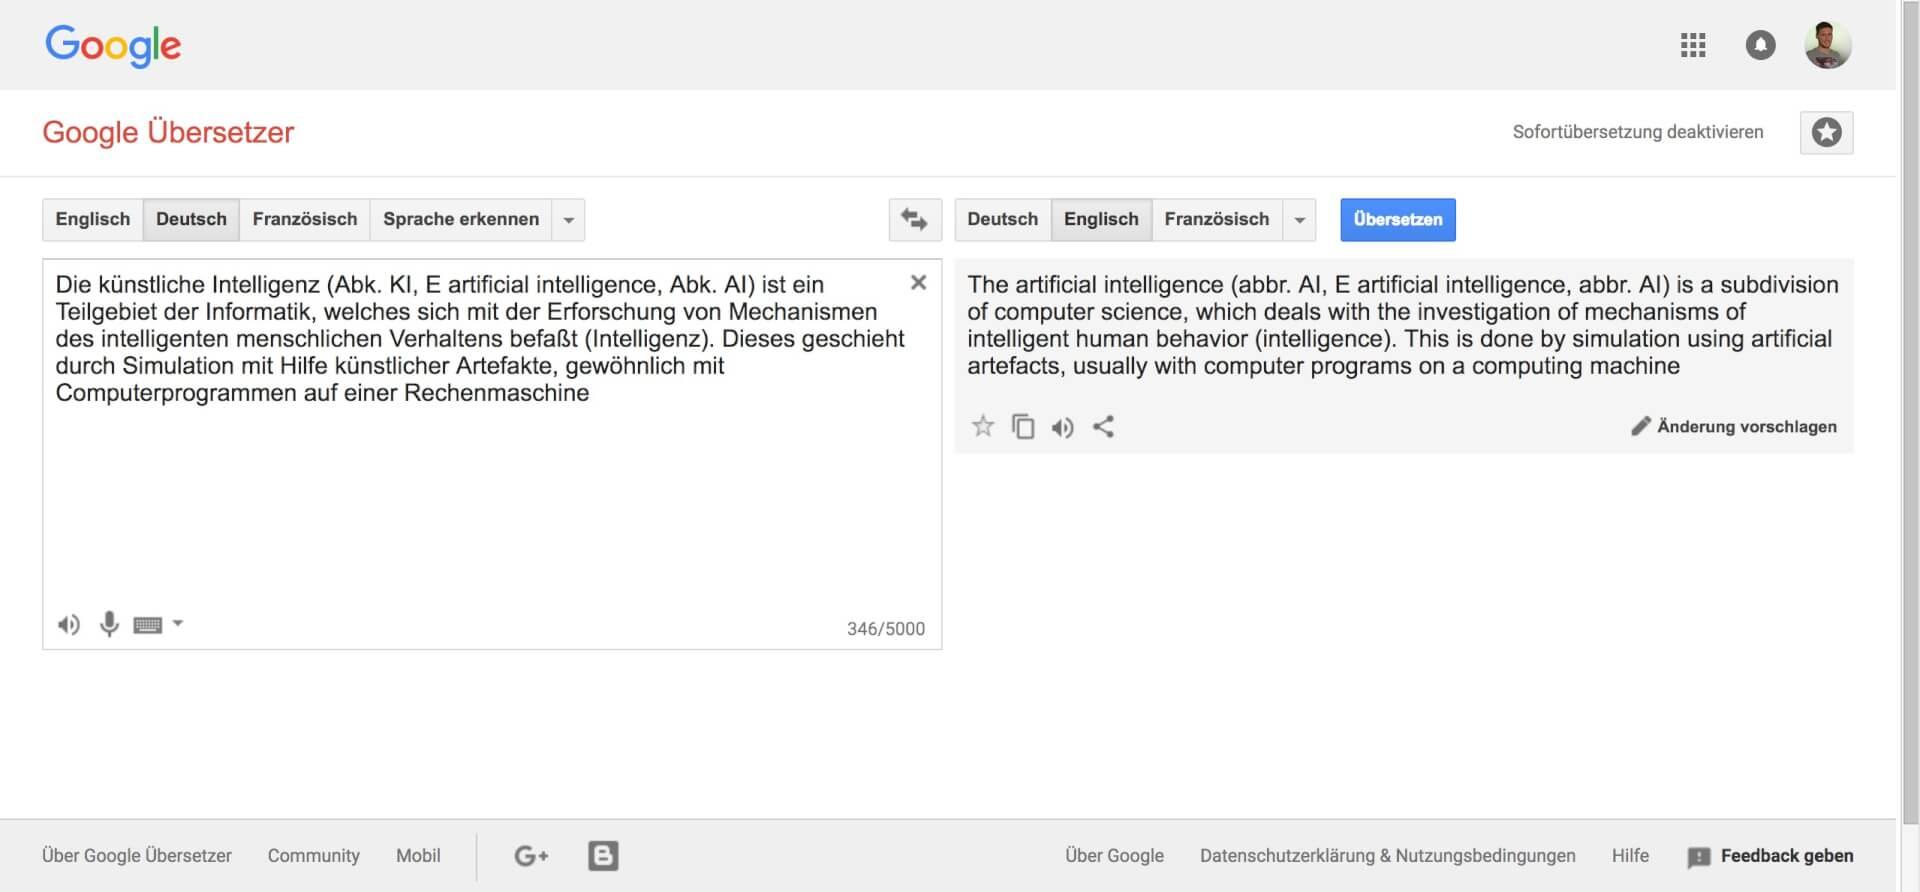 Test 2 Google U  bersetzer